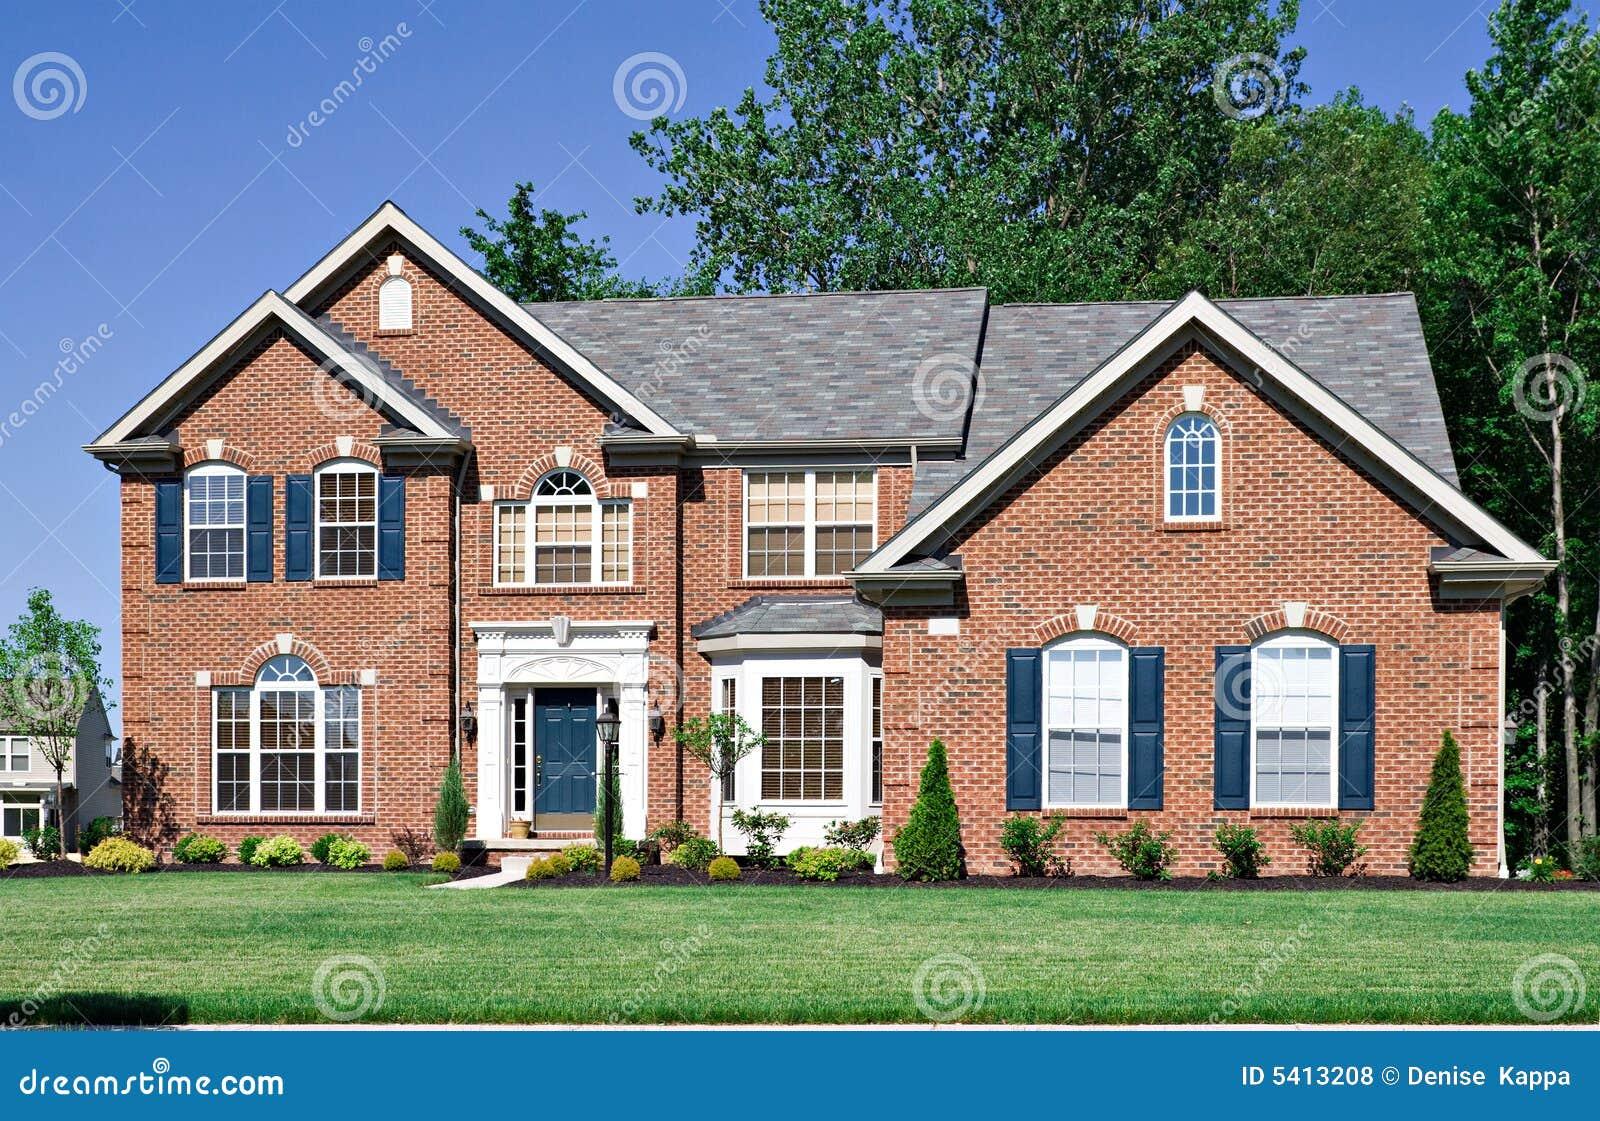 New Brick House Royalty Free Stock Photos Image 5413208